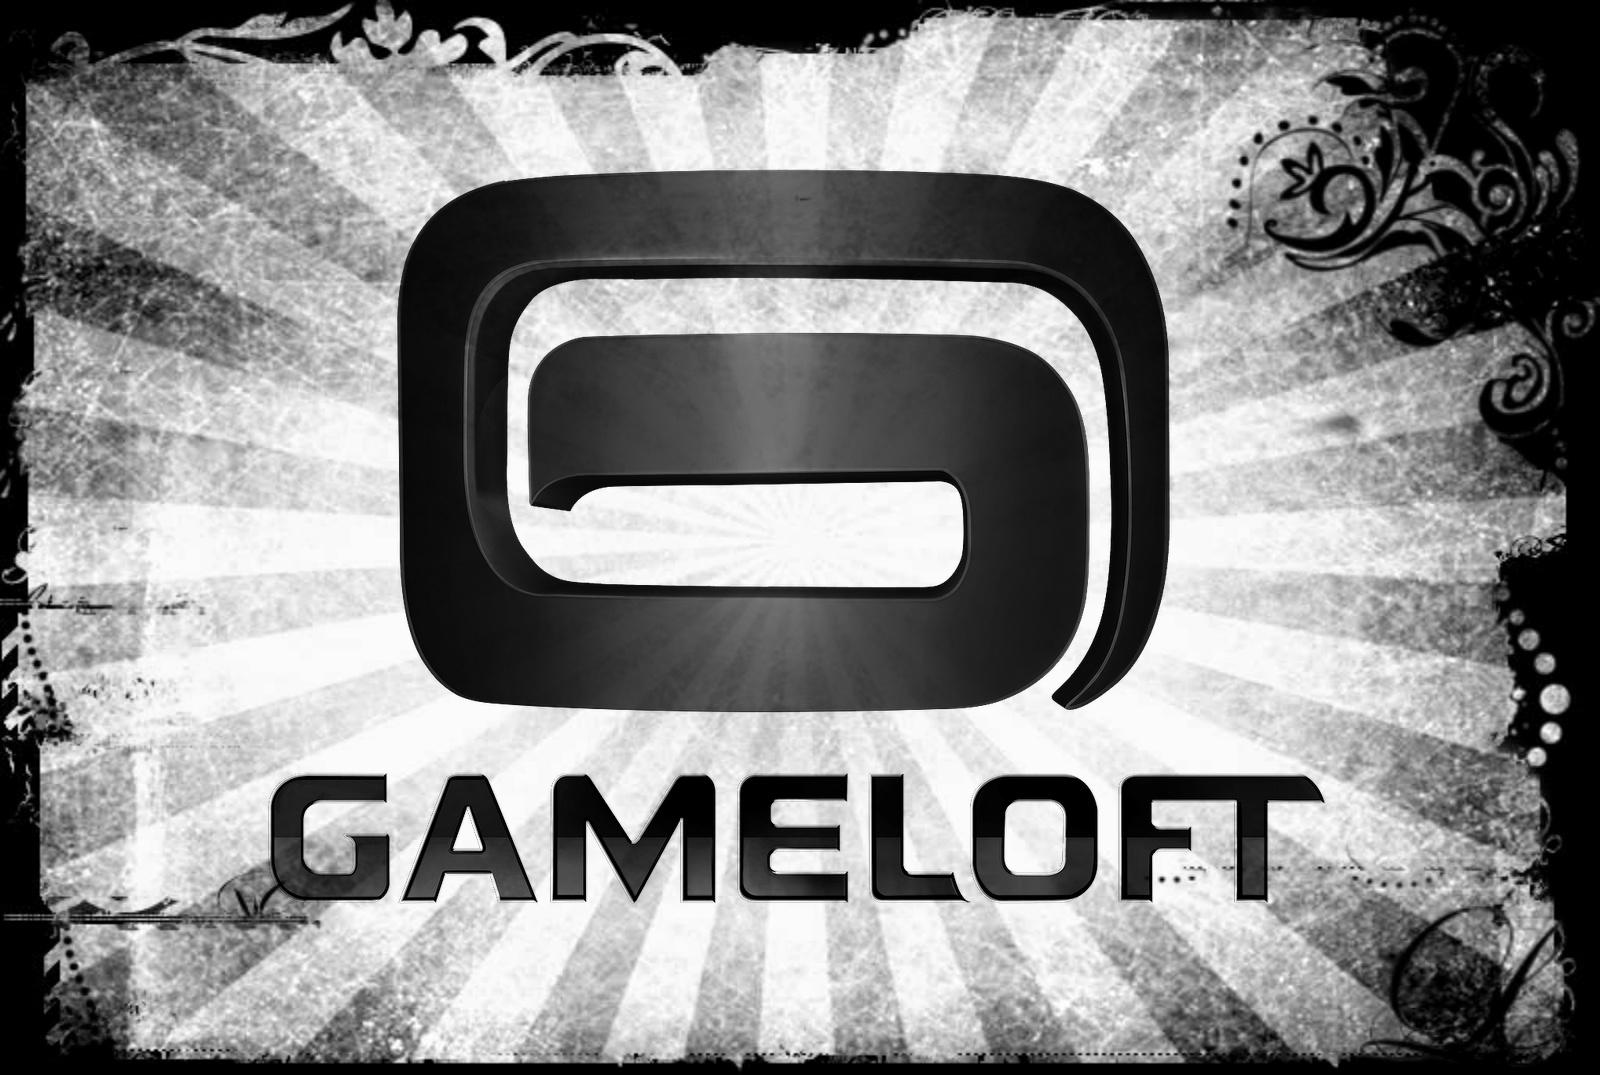 cheat code, gameloft